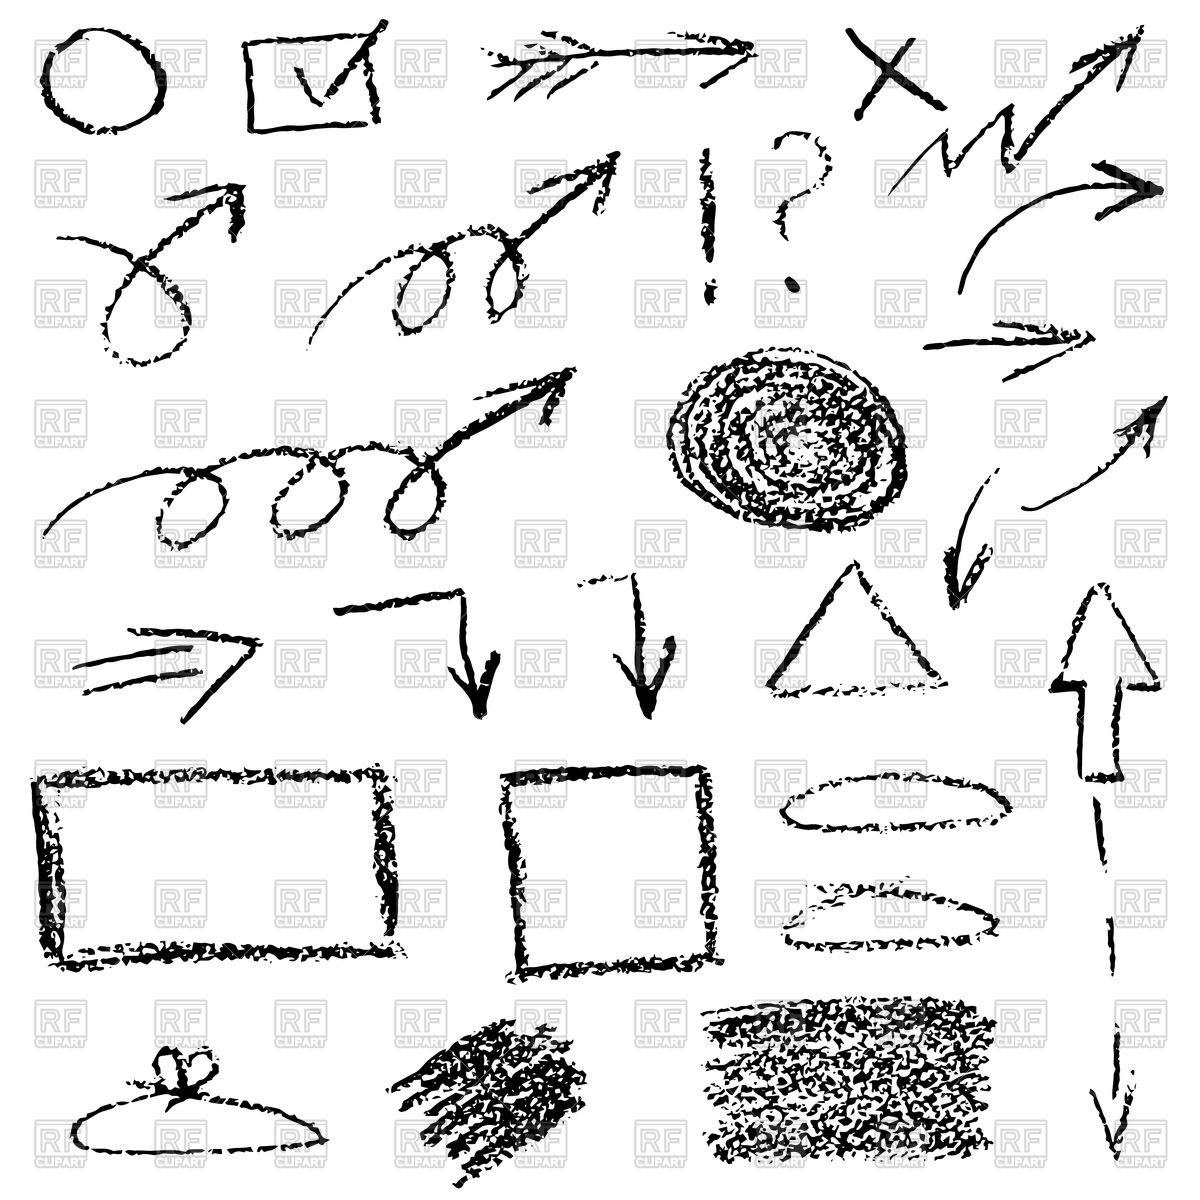 free vector drawing at getdrawings com free for personal use free rh getdrawings com free vector clipart cdr download free vector clipart cdr download